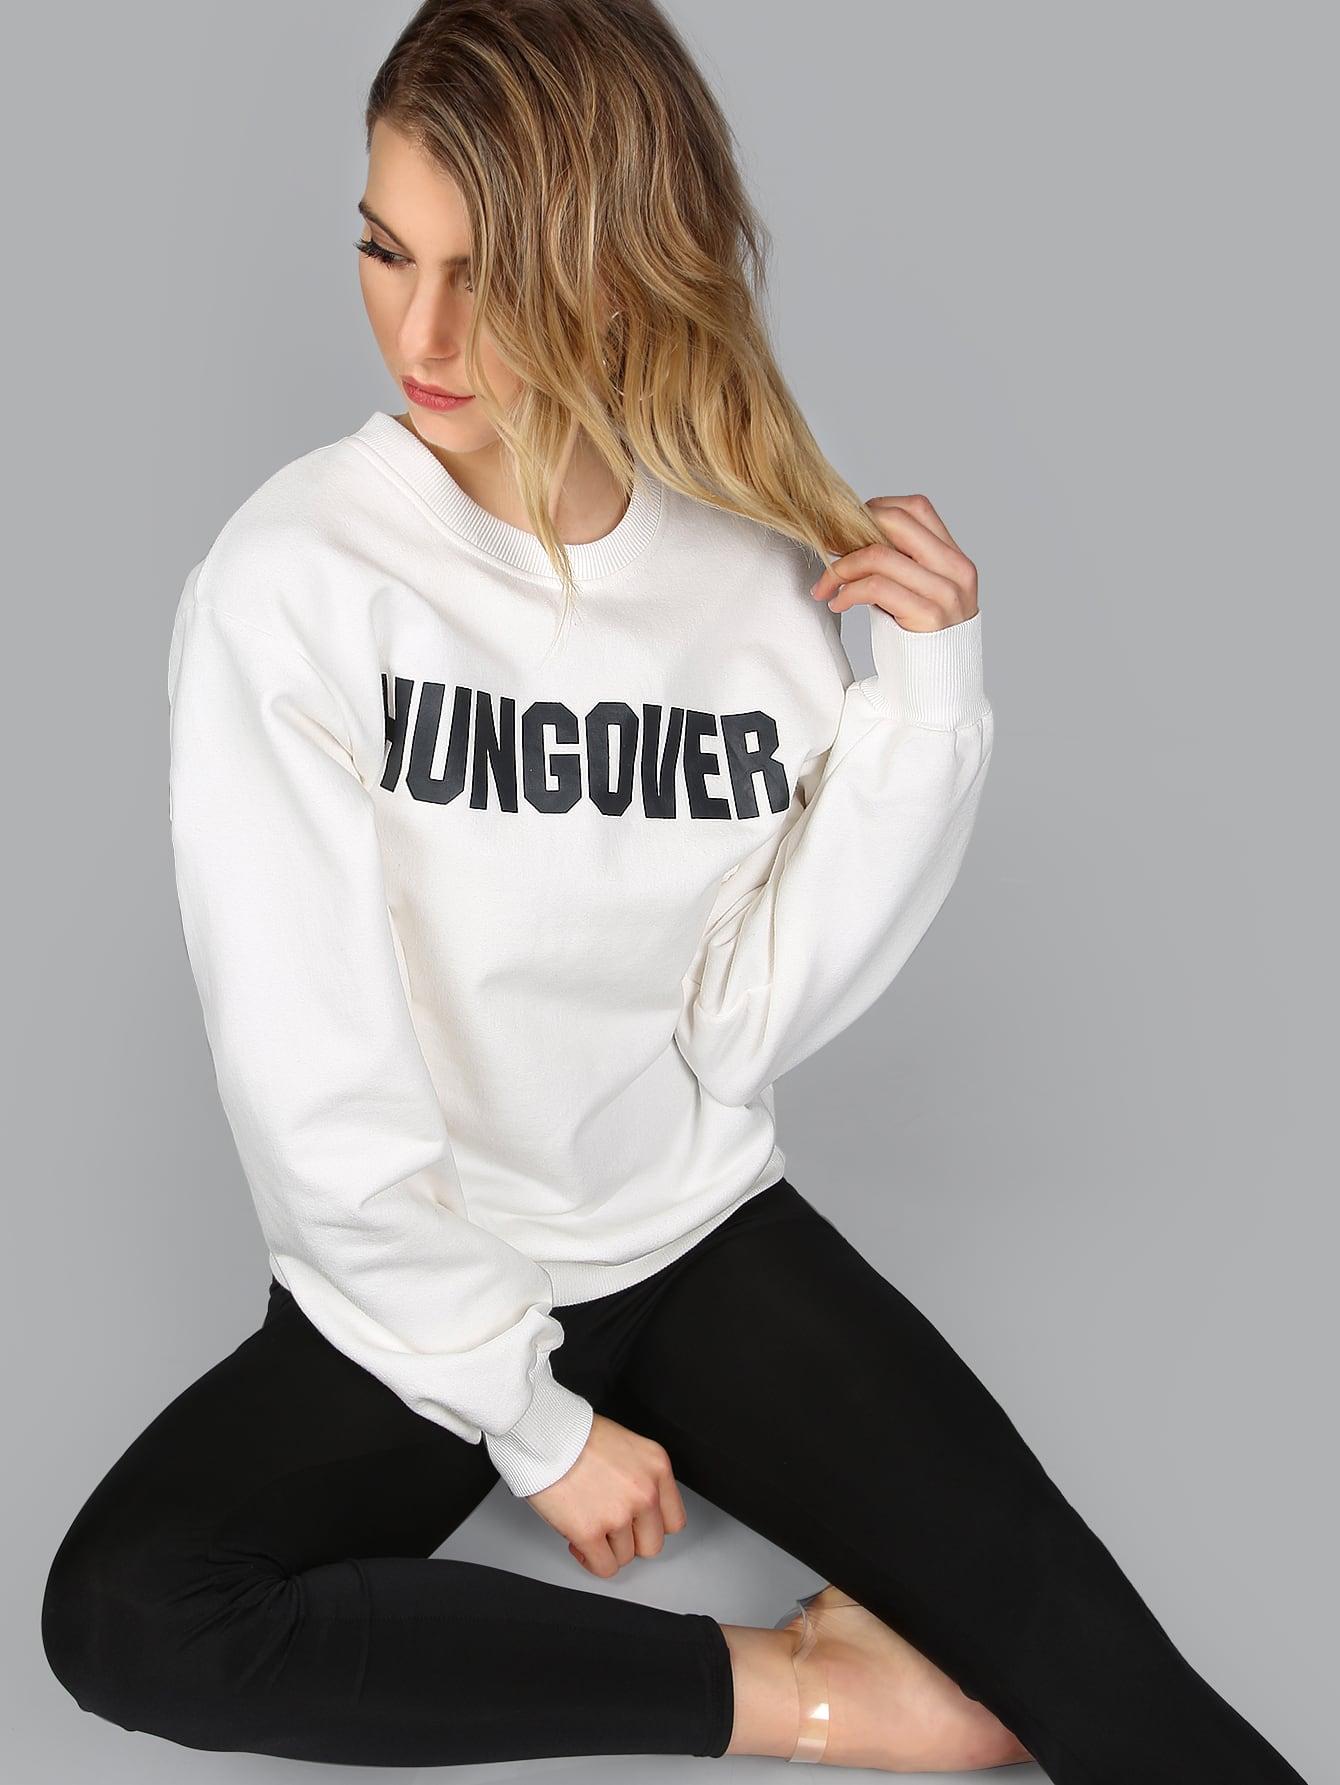 White Letter Print SweatshirtWhite Letter Print Sweatshirt<br><br>color: White<br>size: L,M,S,XS